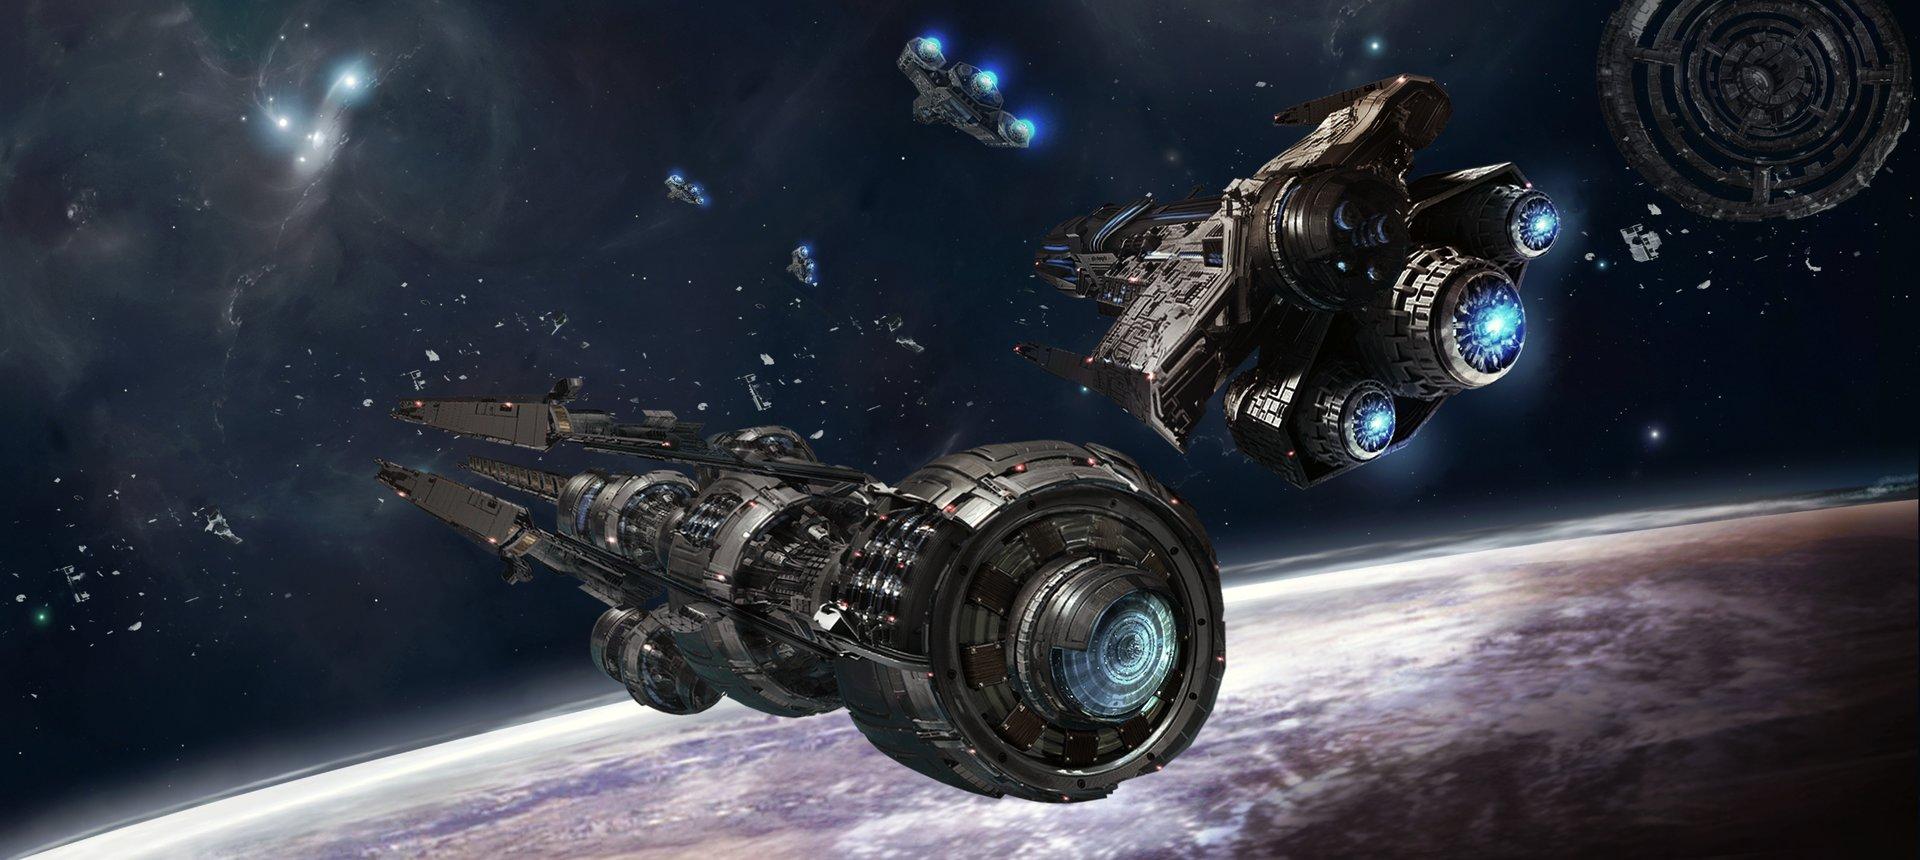 andrii-shafetov-terran-the-orbit.jpg?143